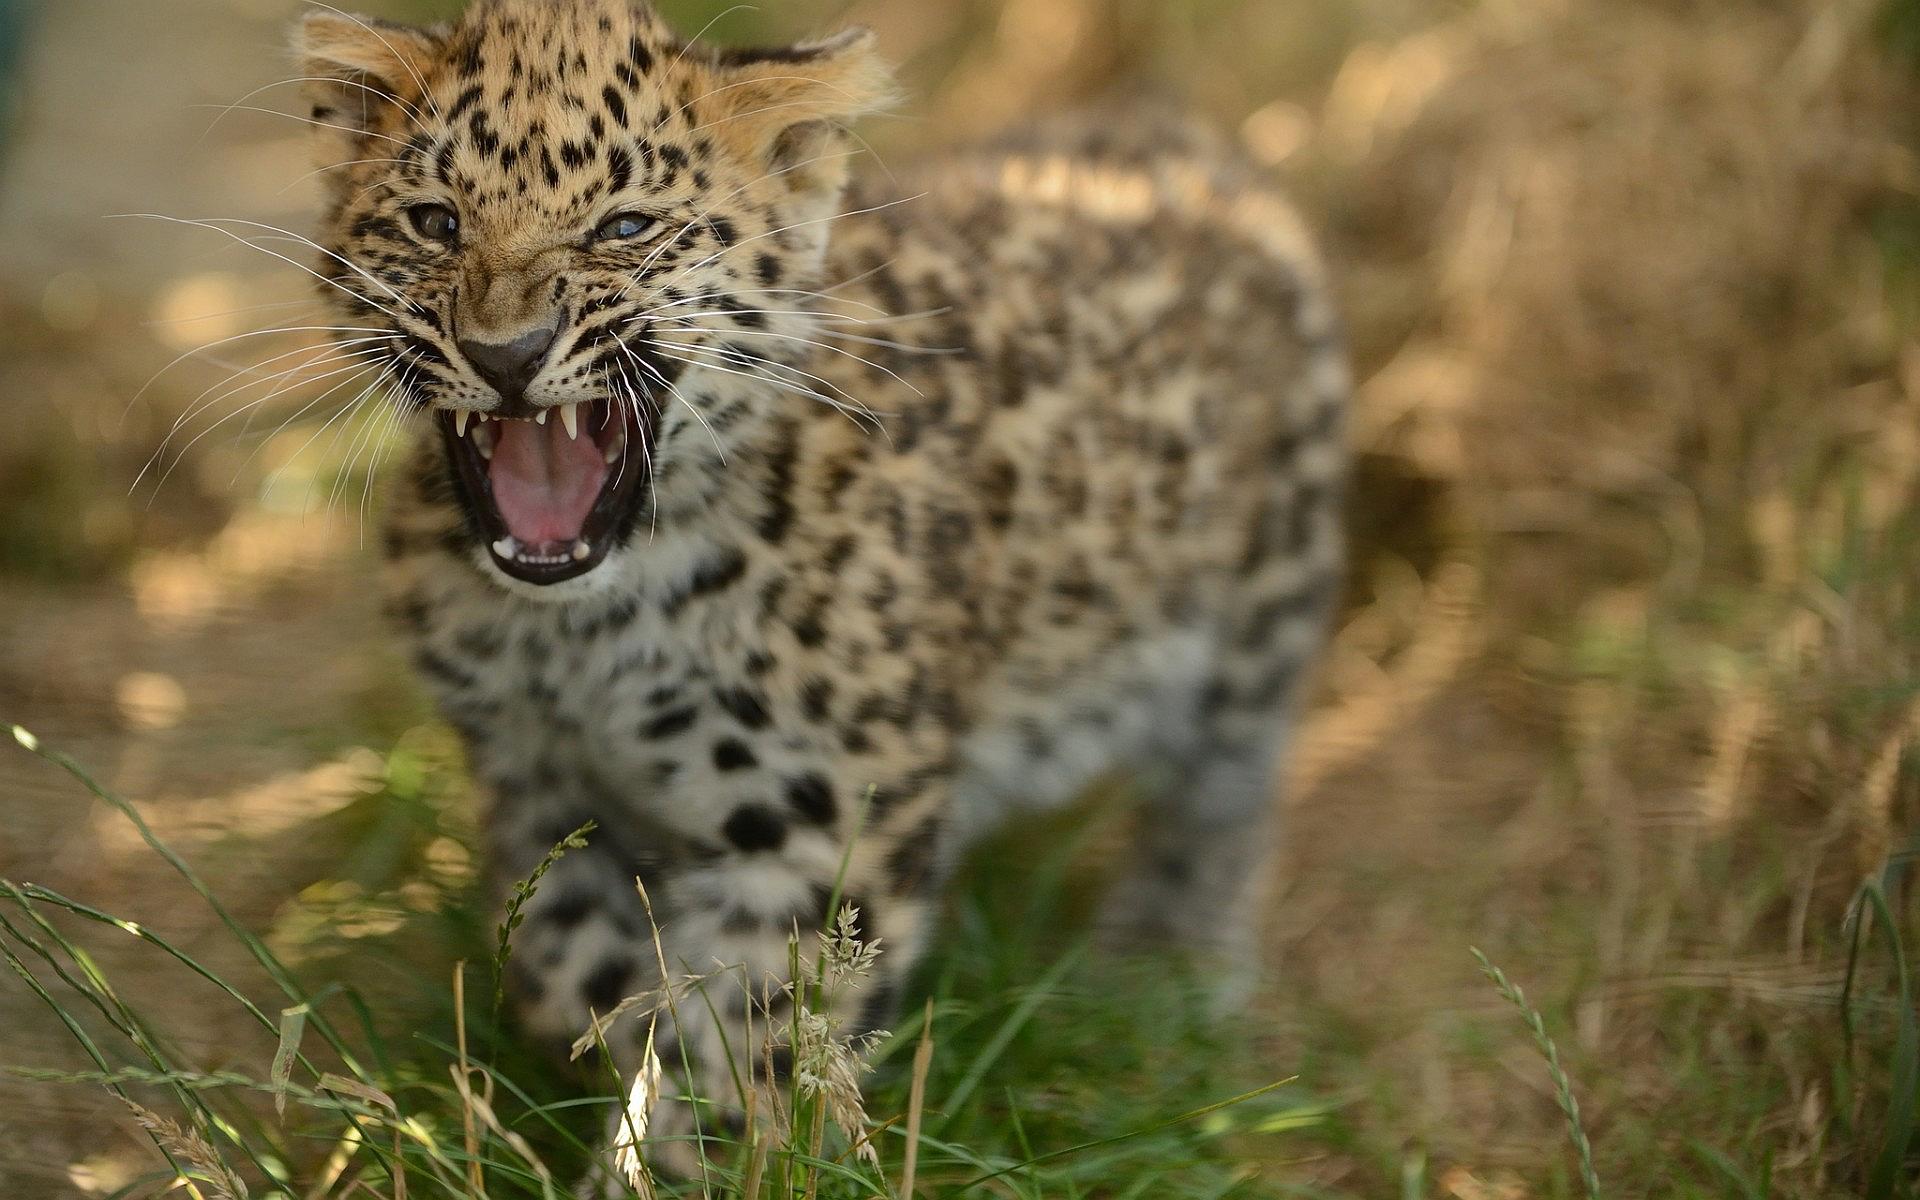 Snow Leopard Cub Beautiful Hd Desktop Wallpapers 4k Hd